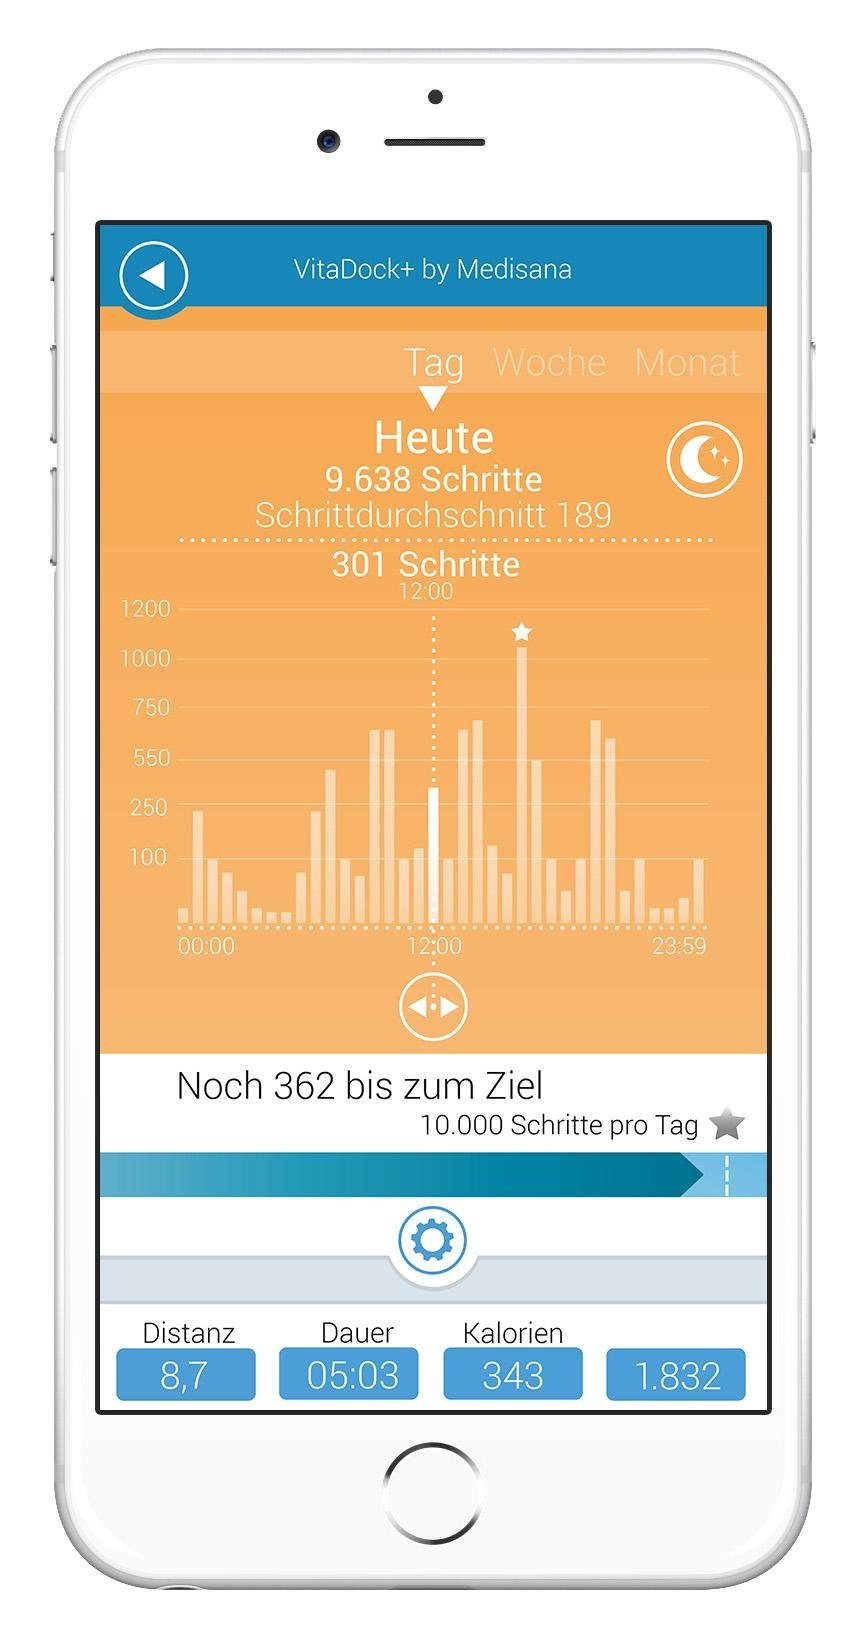 medisana vifit activity tracker mx3 vitadock app amazon. Black Bedroom Furniture Sets. Home Design Ideas